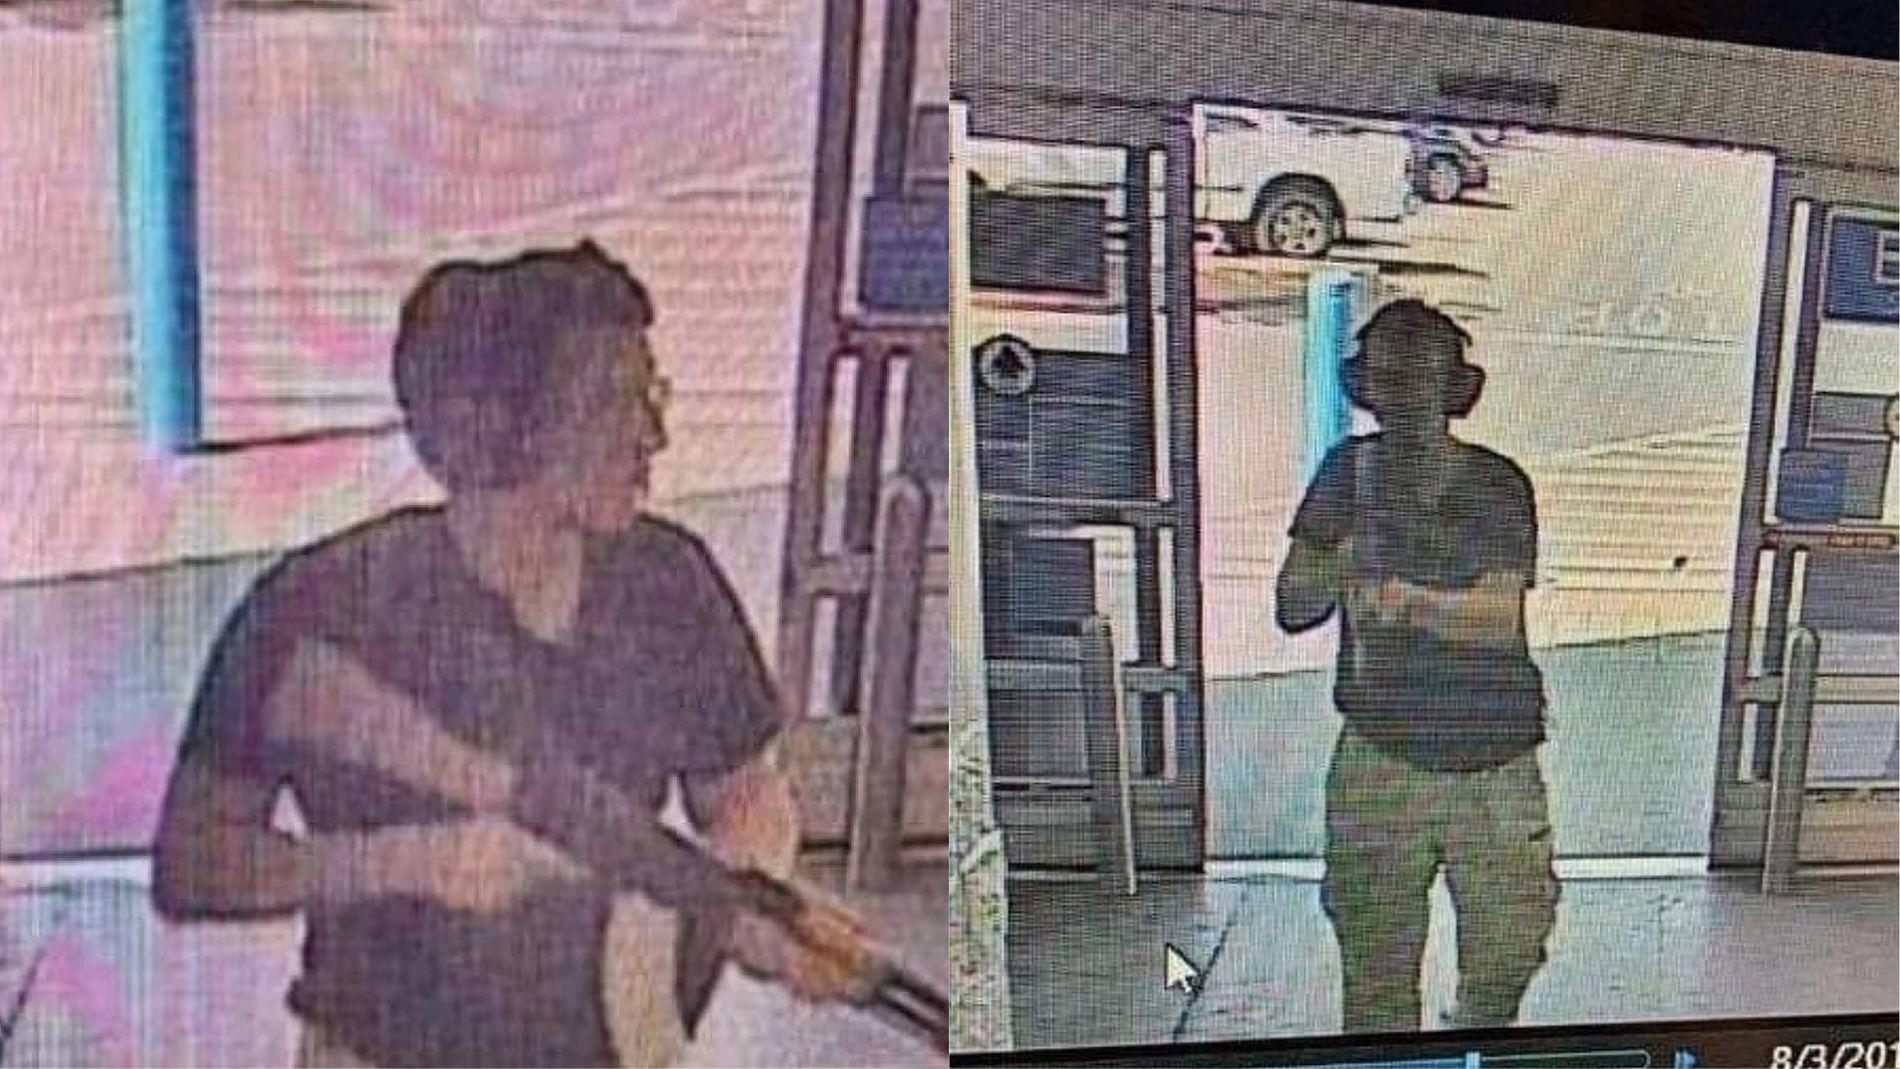 SKAL VISE SKYTTEREN: Dette bildet fra et overvåkningskamera skal ifølge KTSM 9 News vise en bevæpnet mann gå inn på supermarkedet Walmart ved Cicelo Vista-kjøpesenteret i El Paso.Foto: Overvåkningskamera